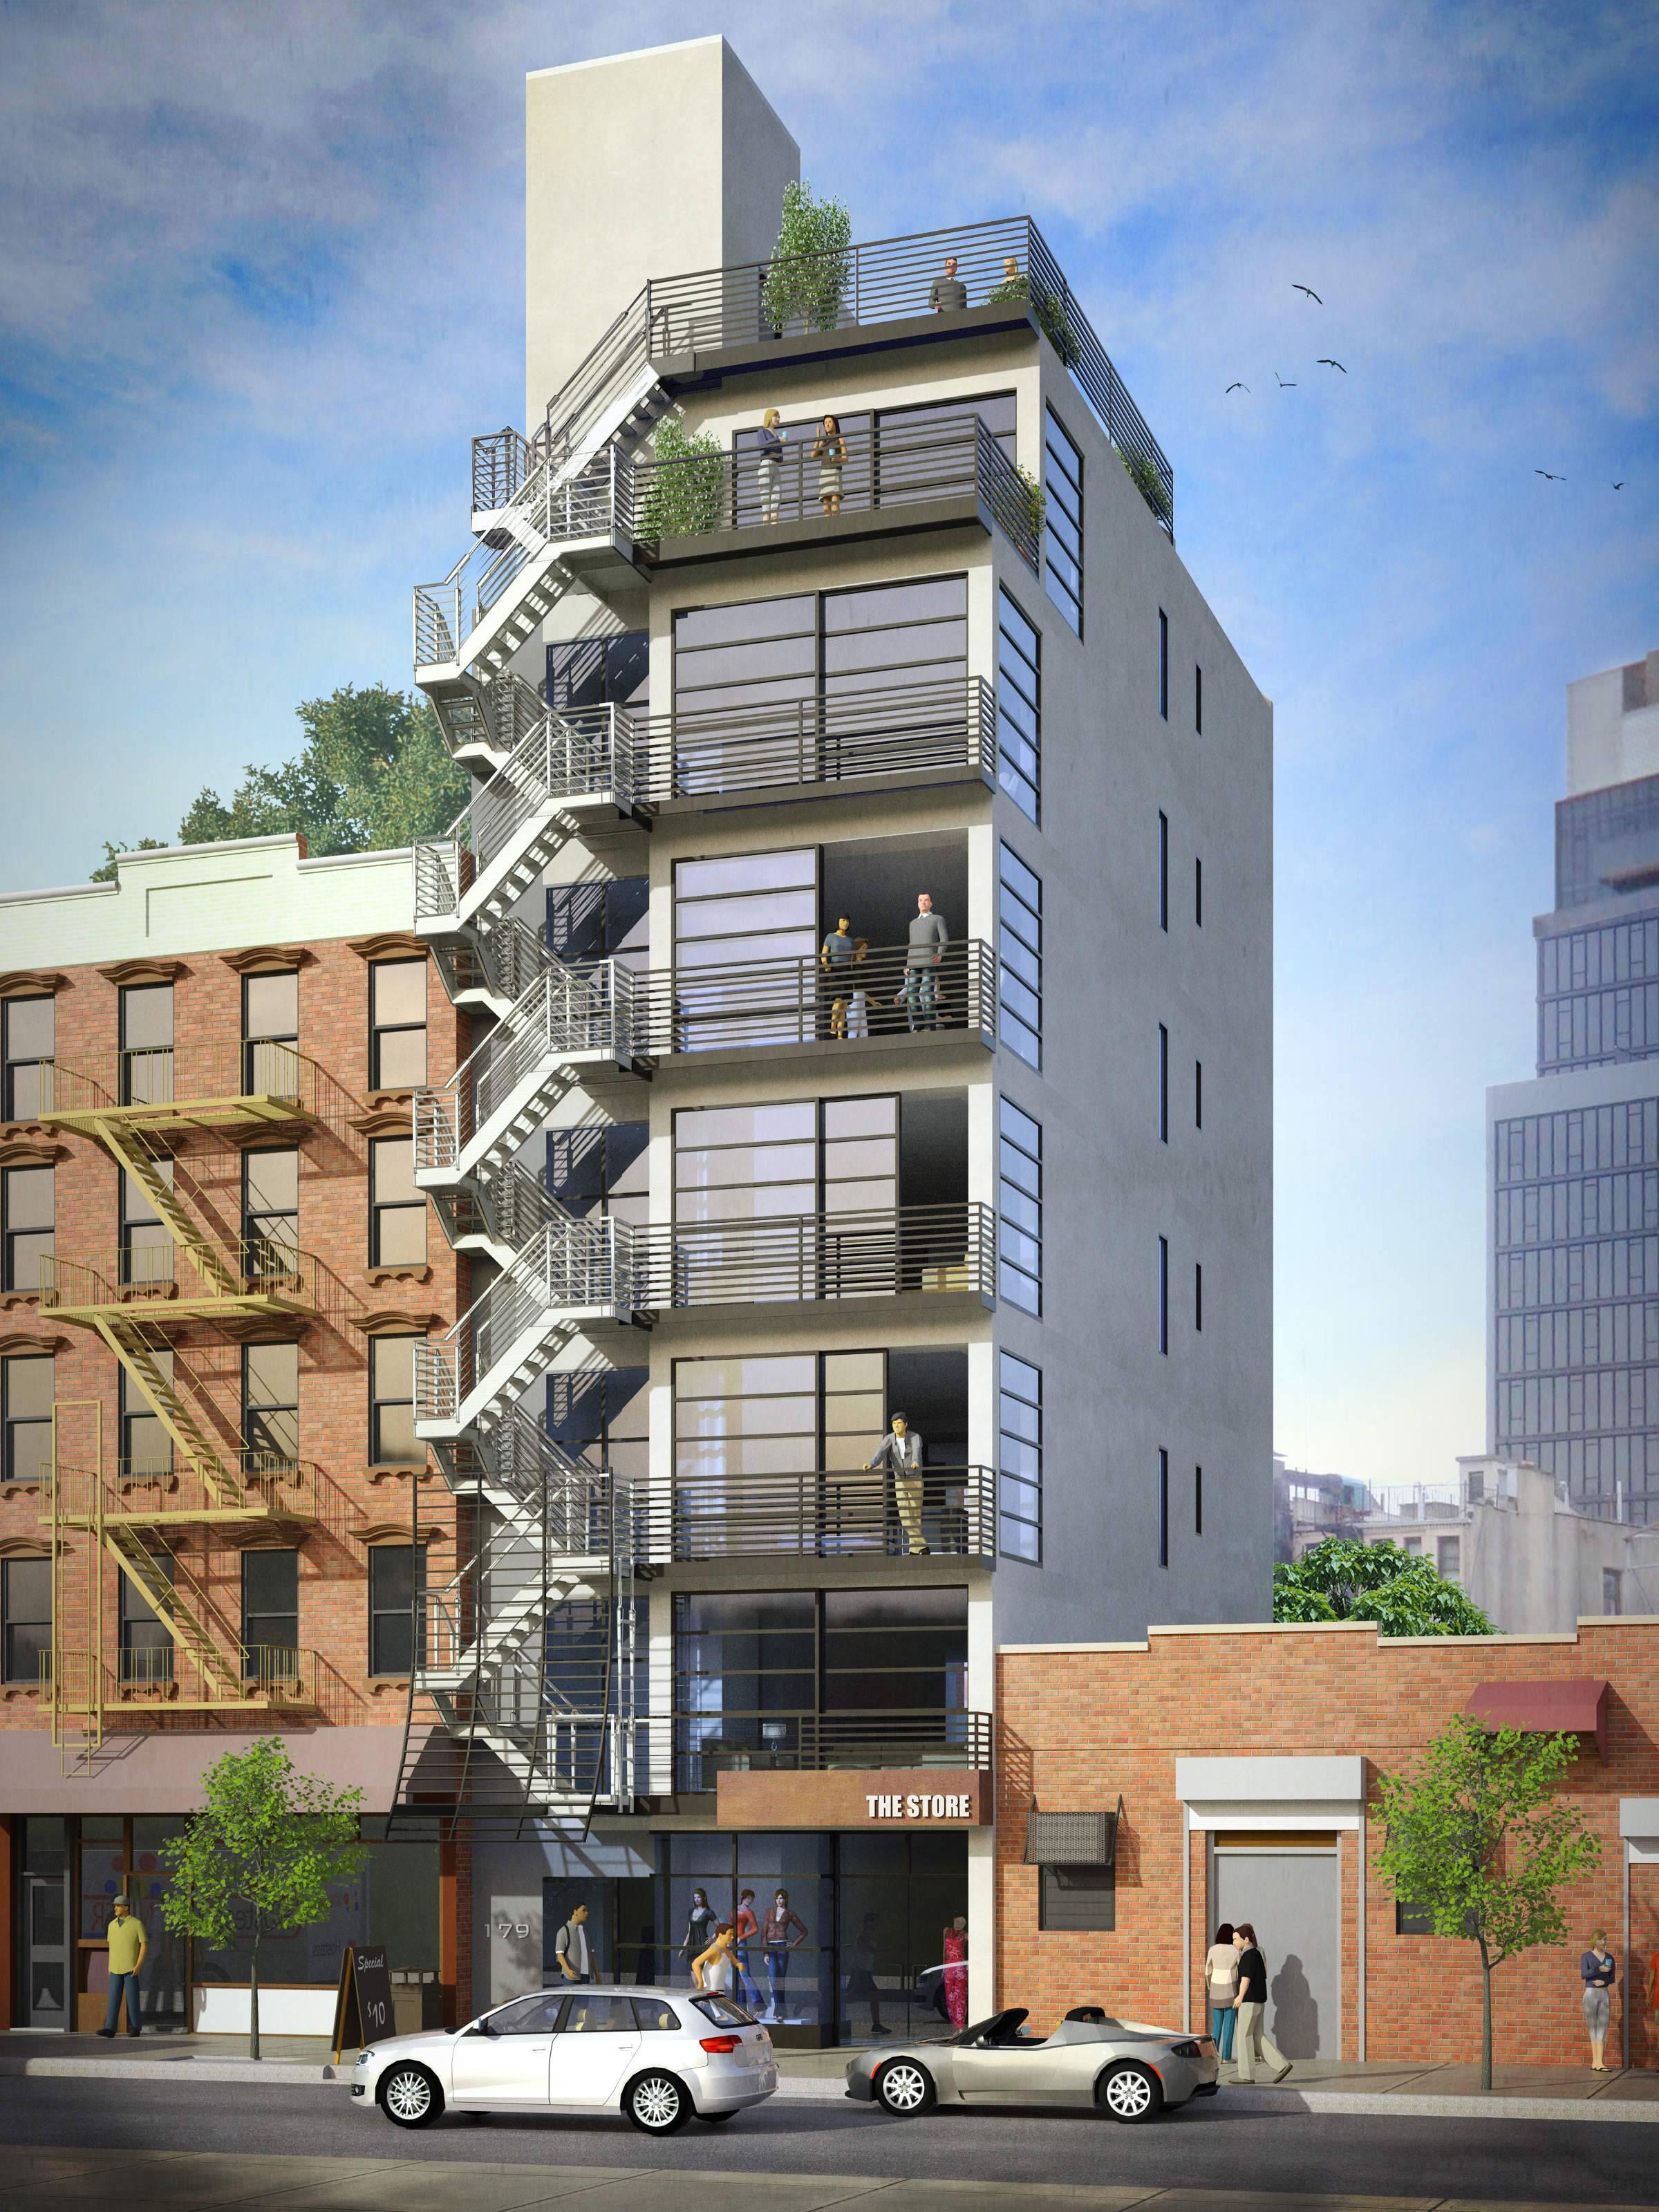 179 Ludlow Street, rendering by Kleinmann Architects